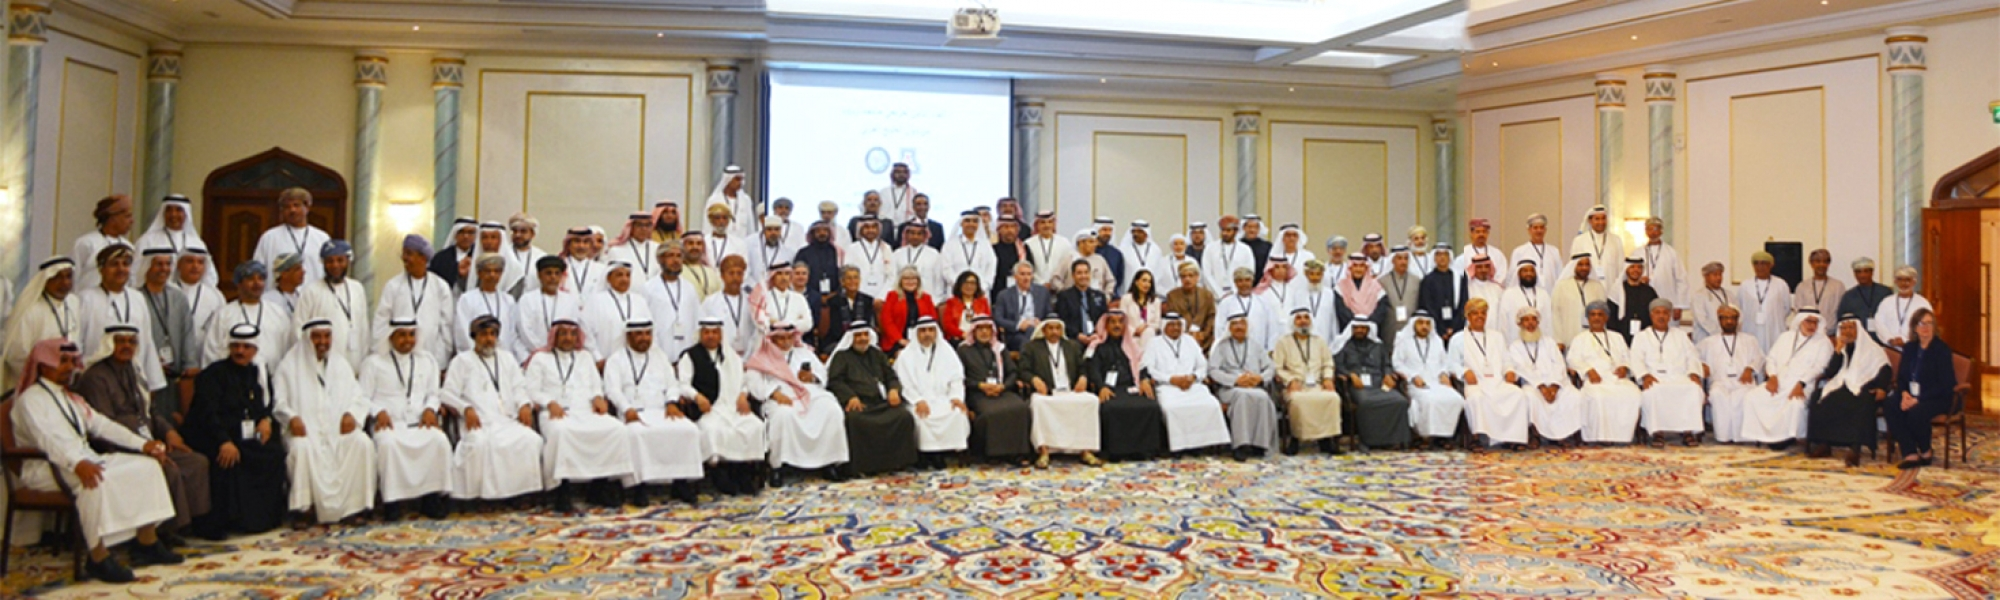 GCC-UA Oman Reunion 2020 group photo